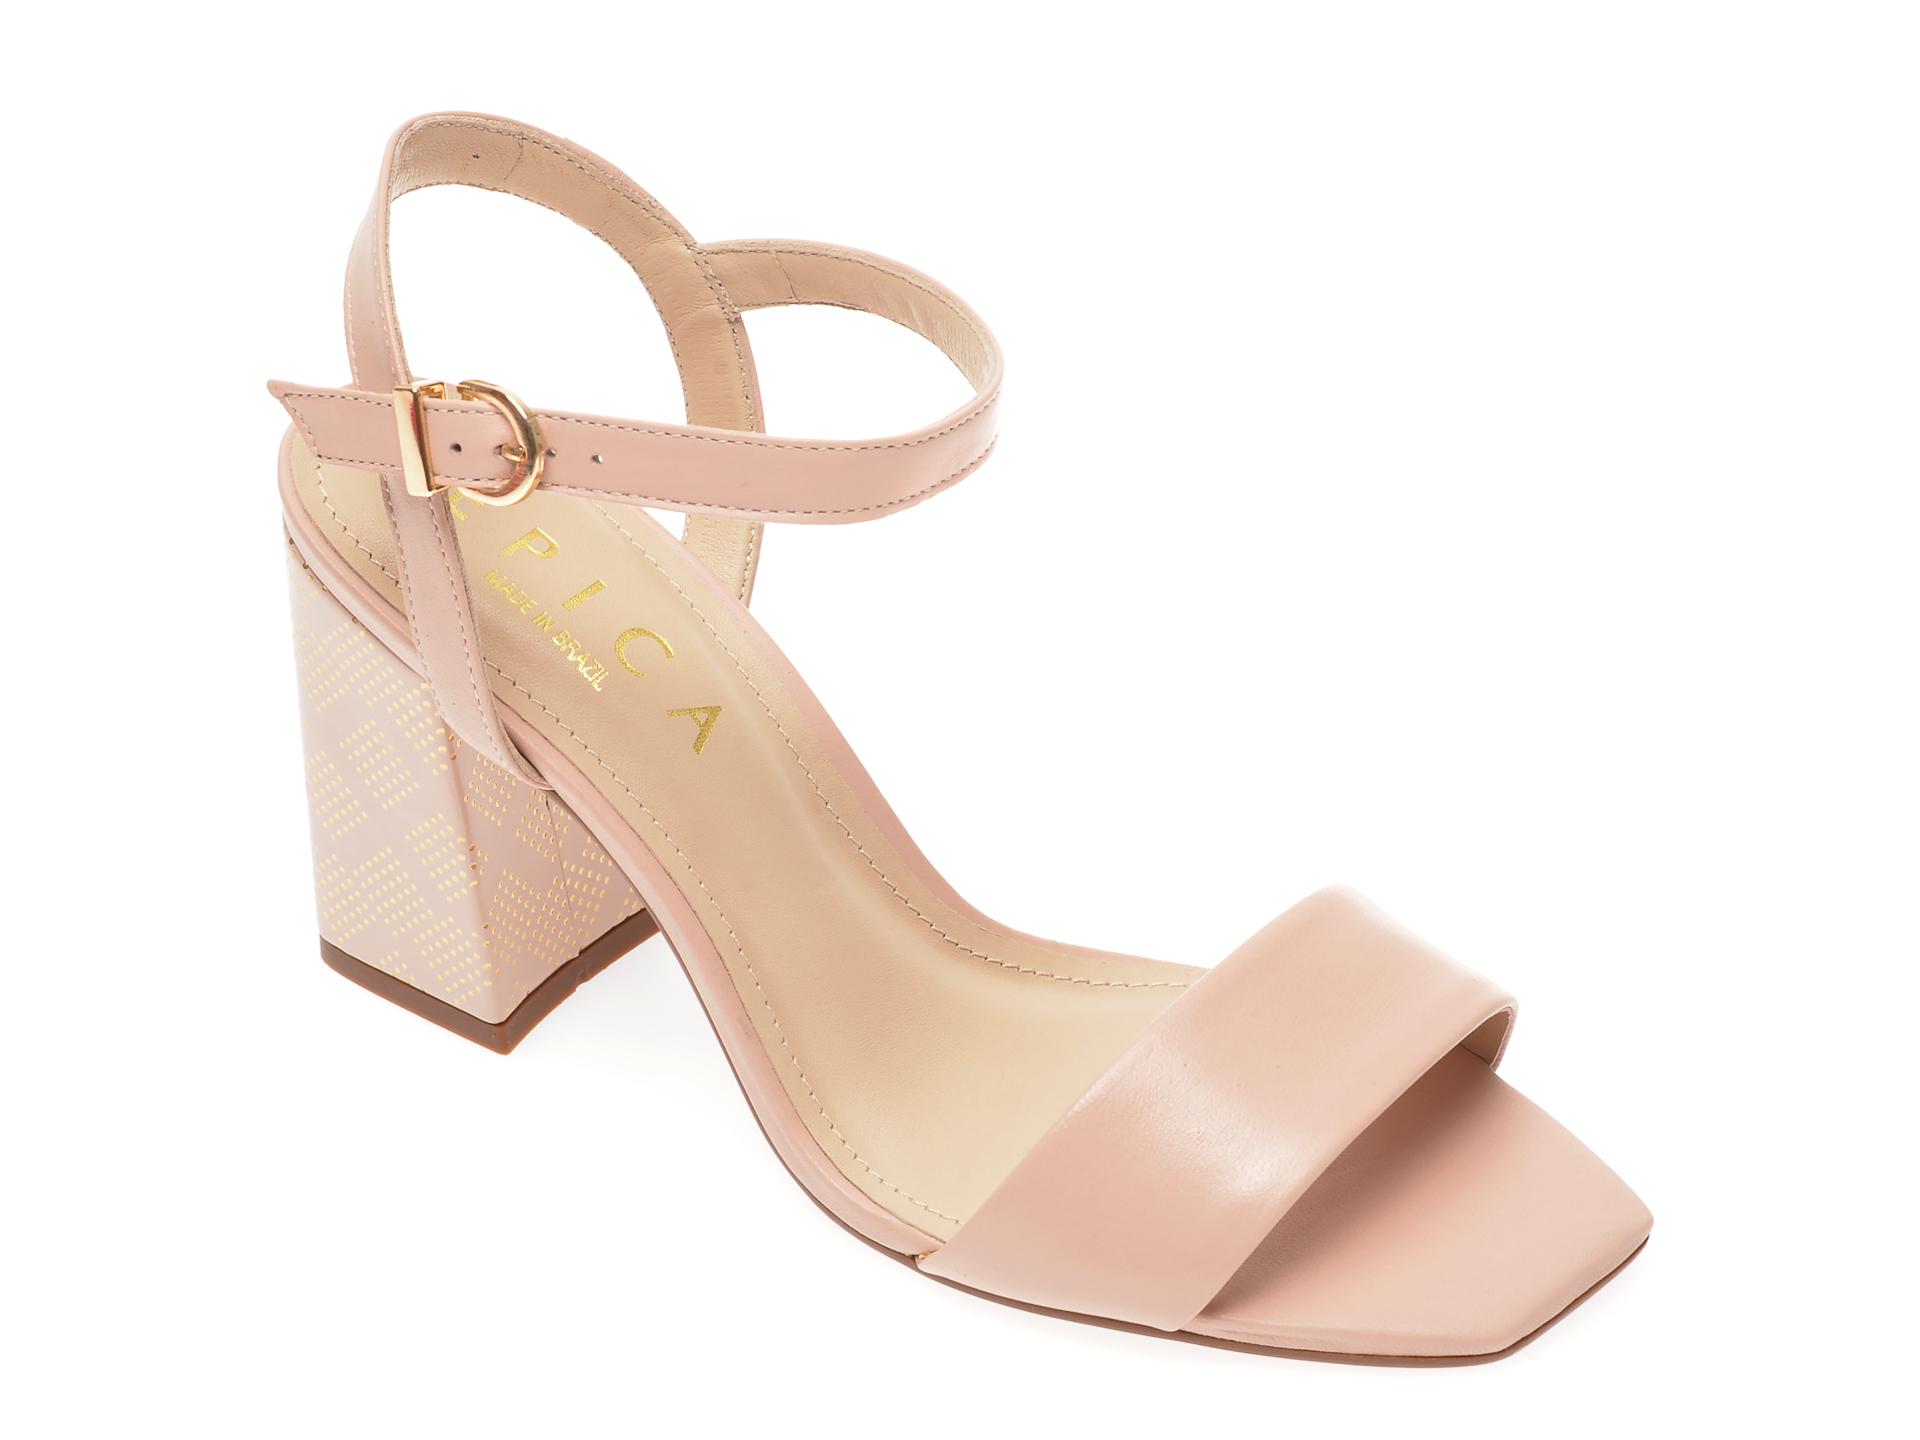 Sandale EPICA bej, 1403407, din piele naturala